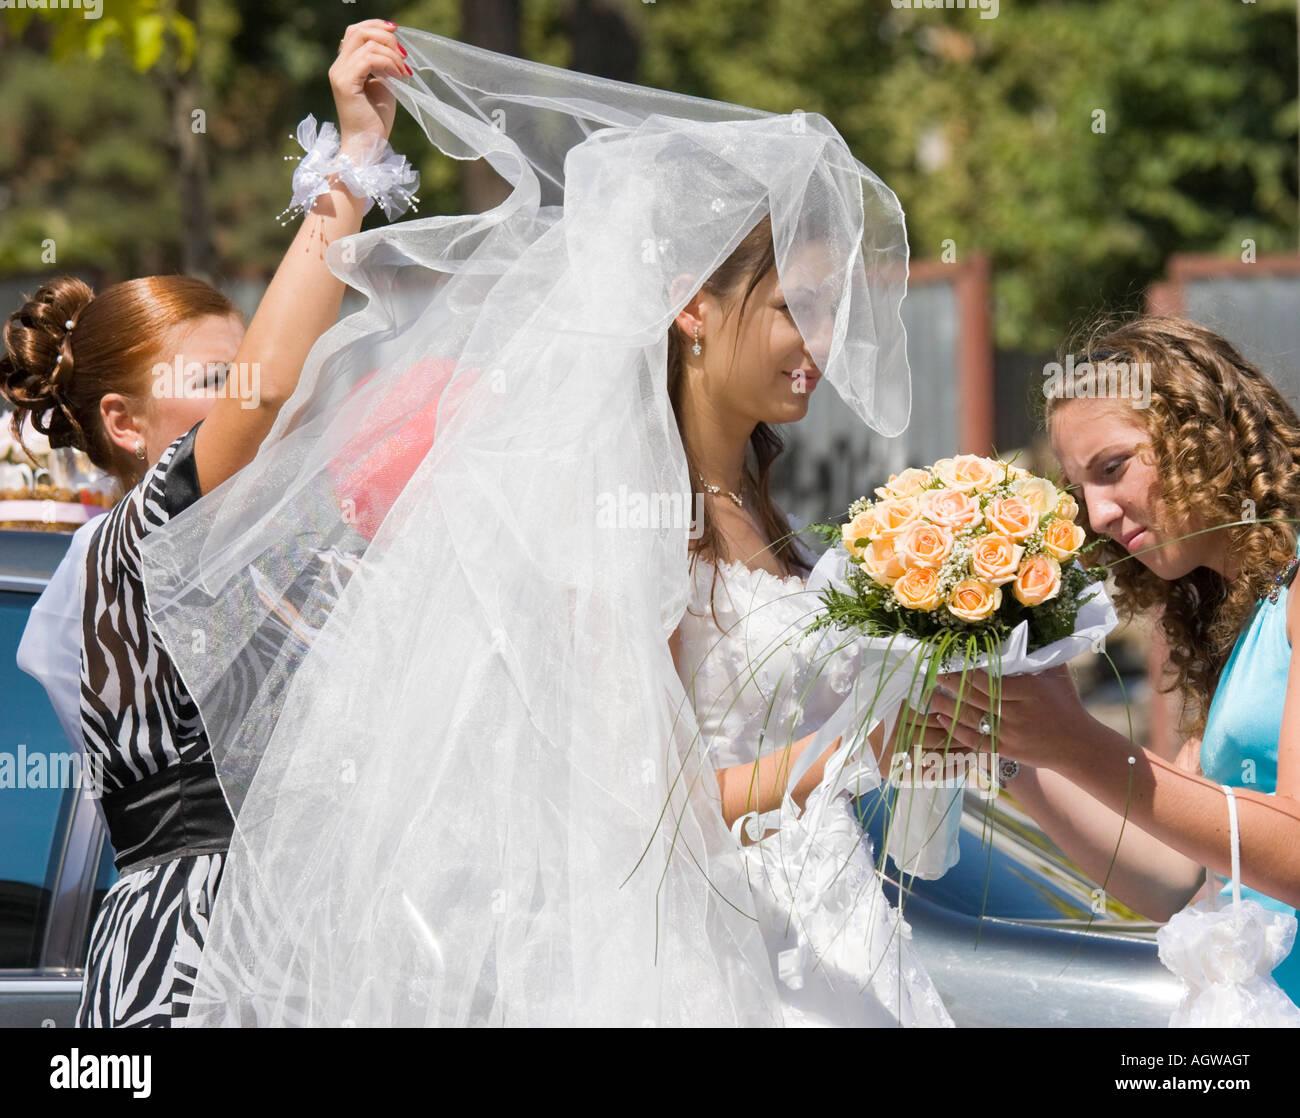 With The Ukrainian Bride Her 93